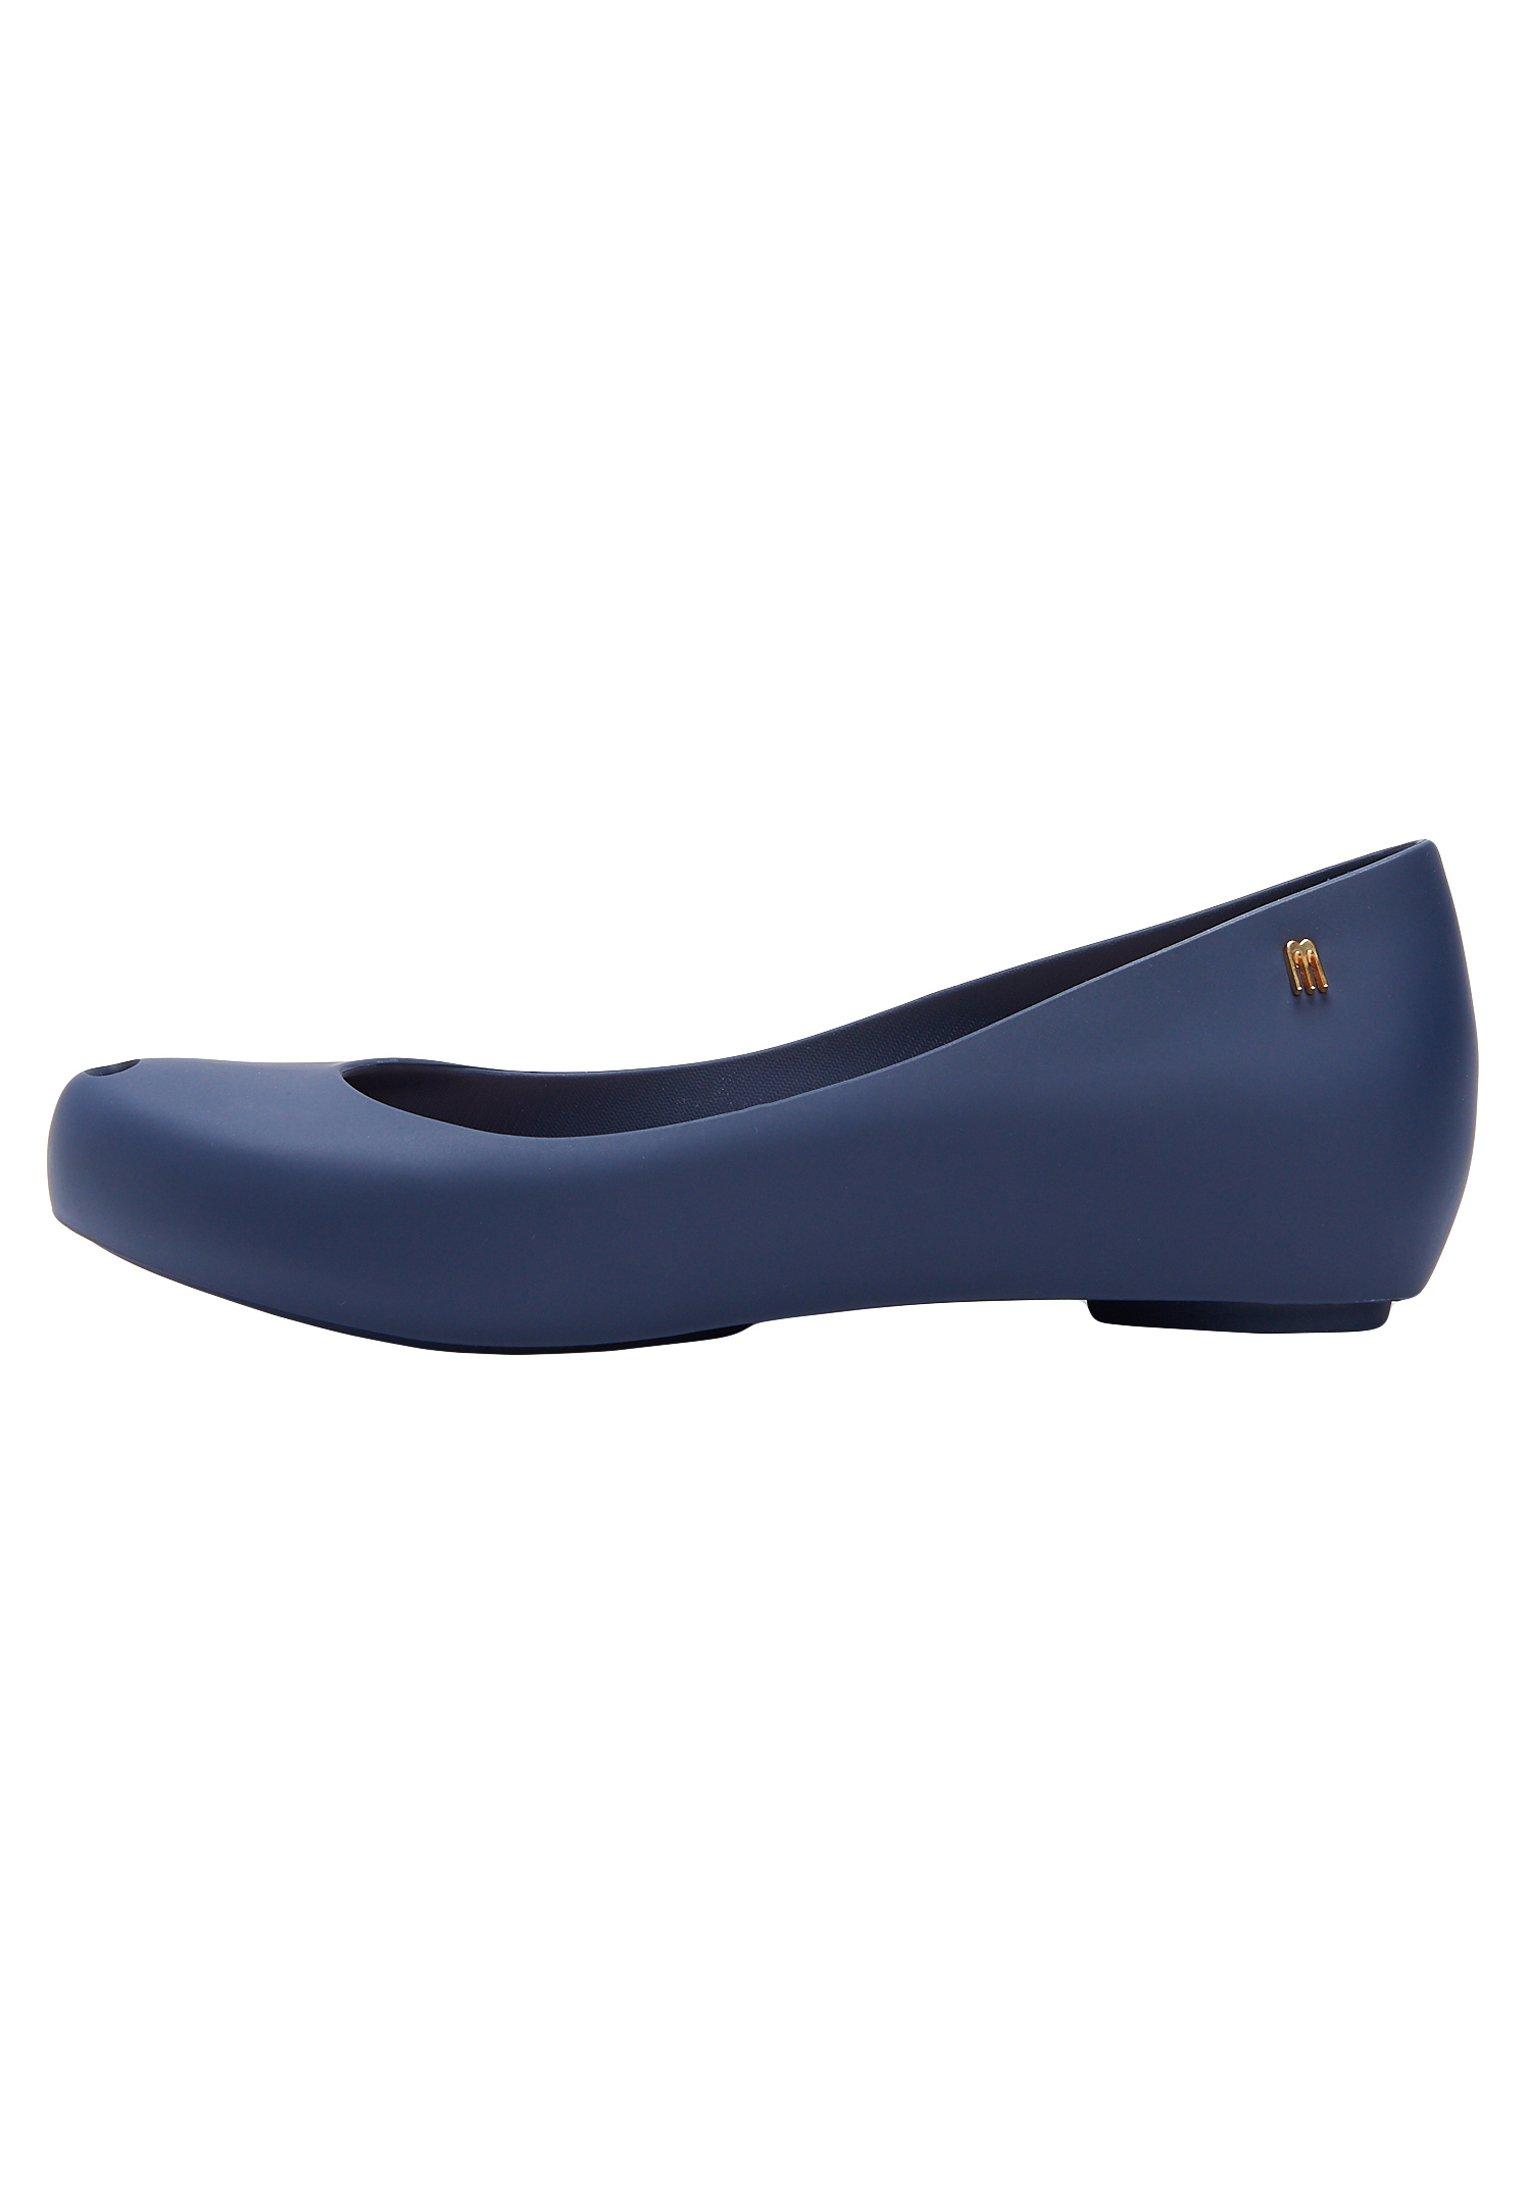 Melissa Ballet pumps - blue